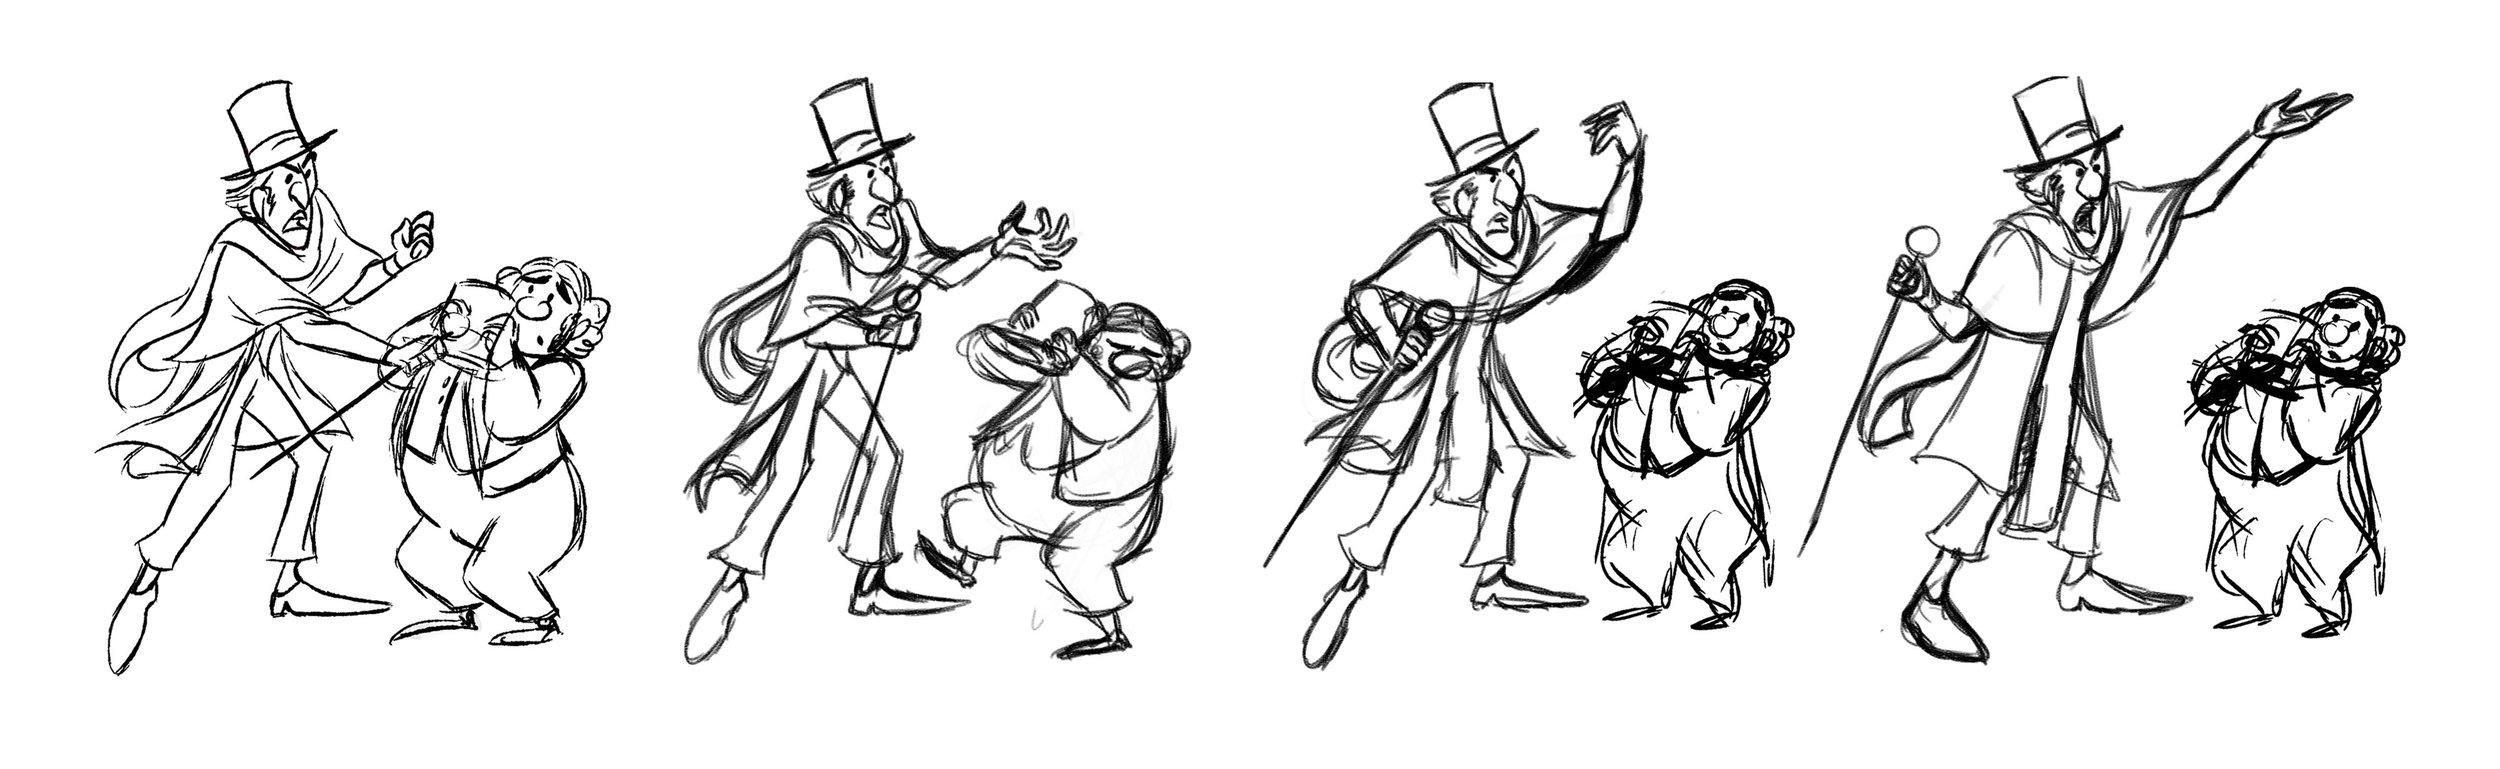 scrooge poses thumbnails.jpg